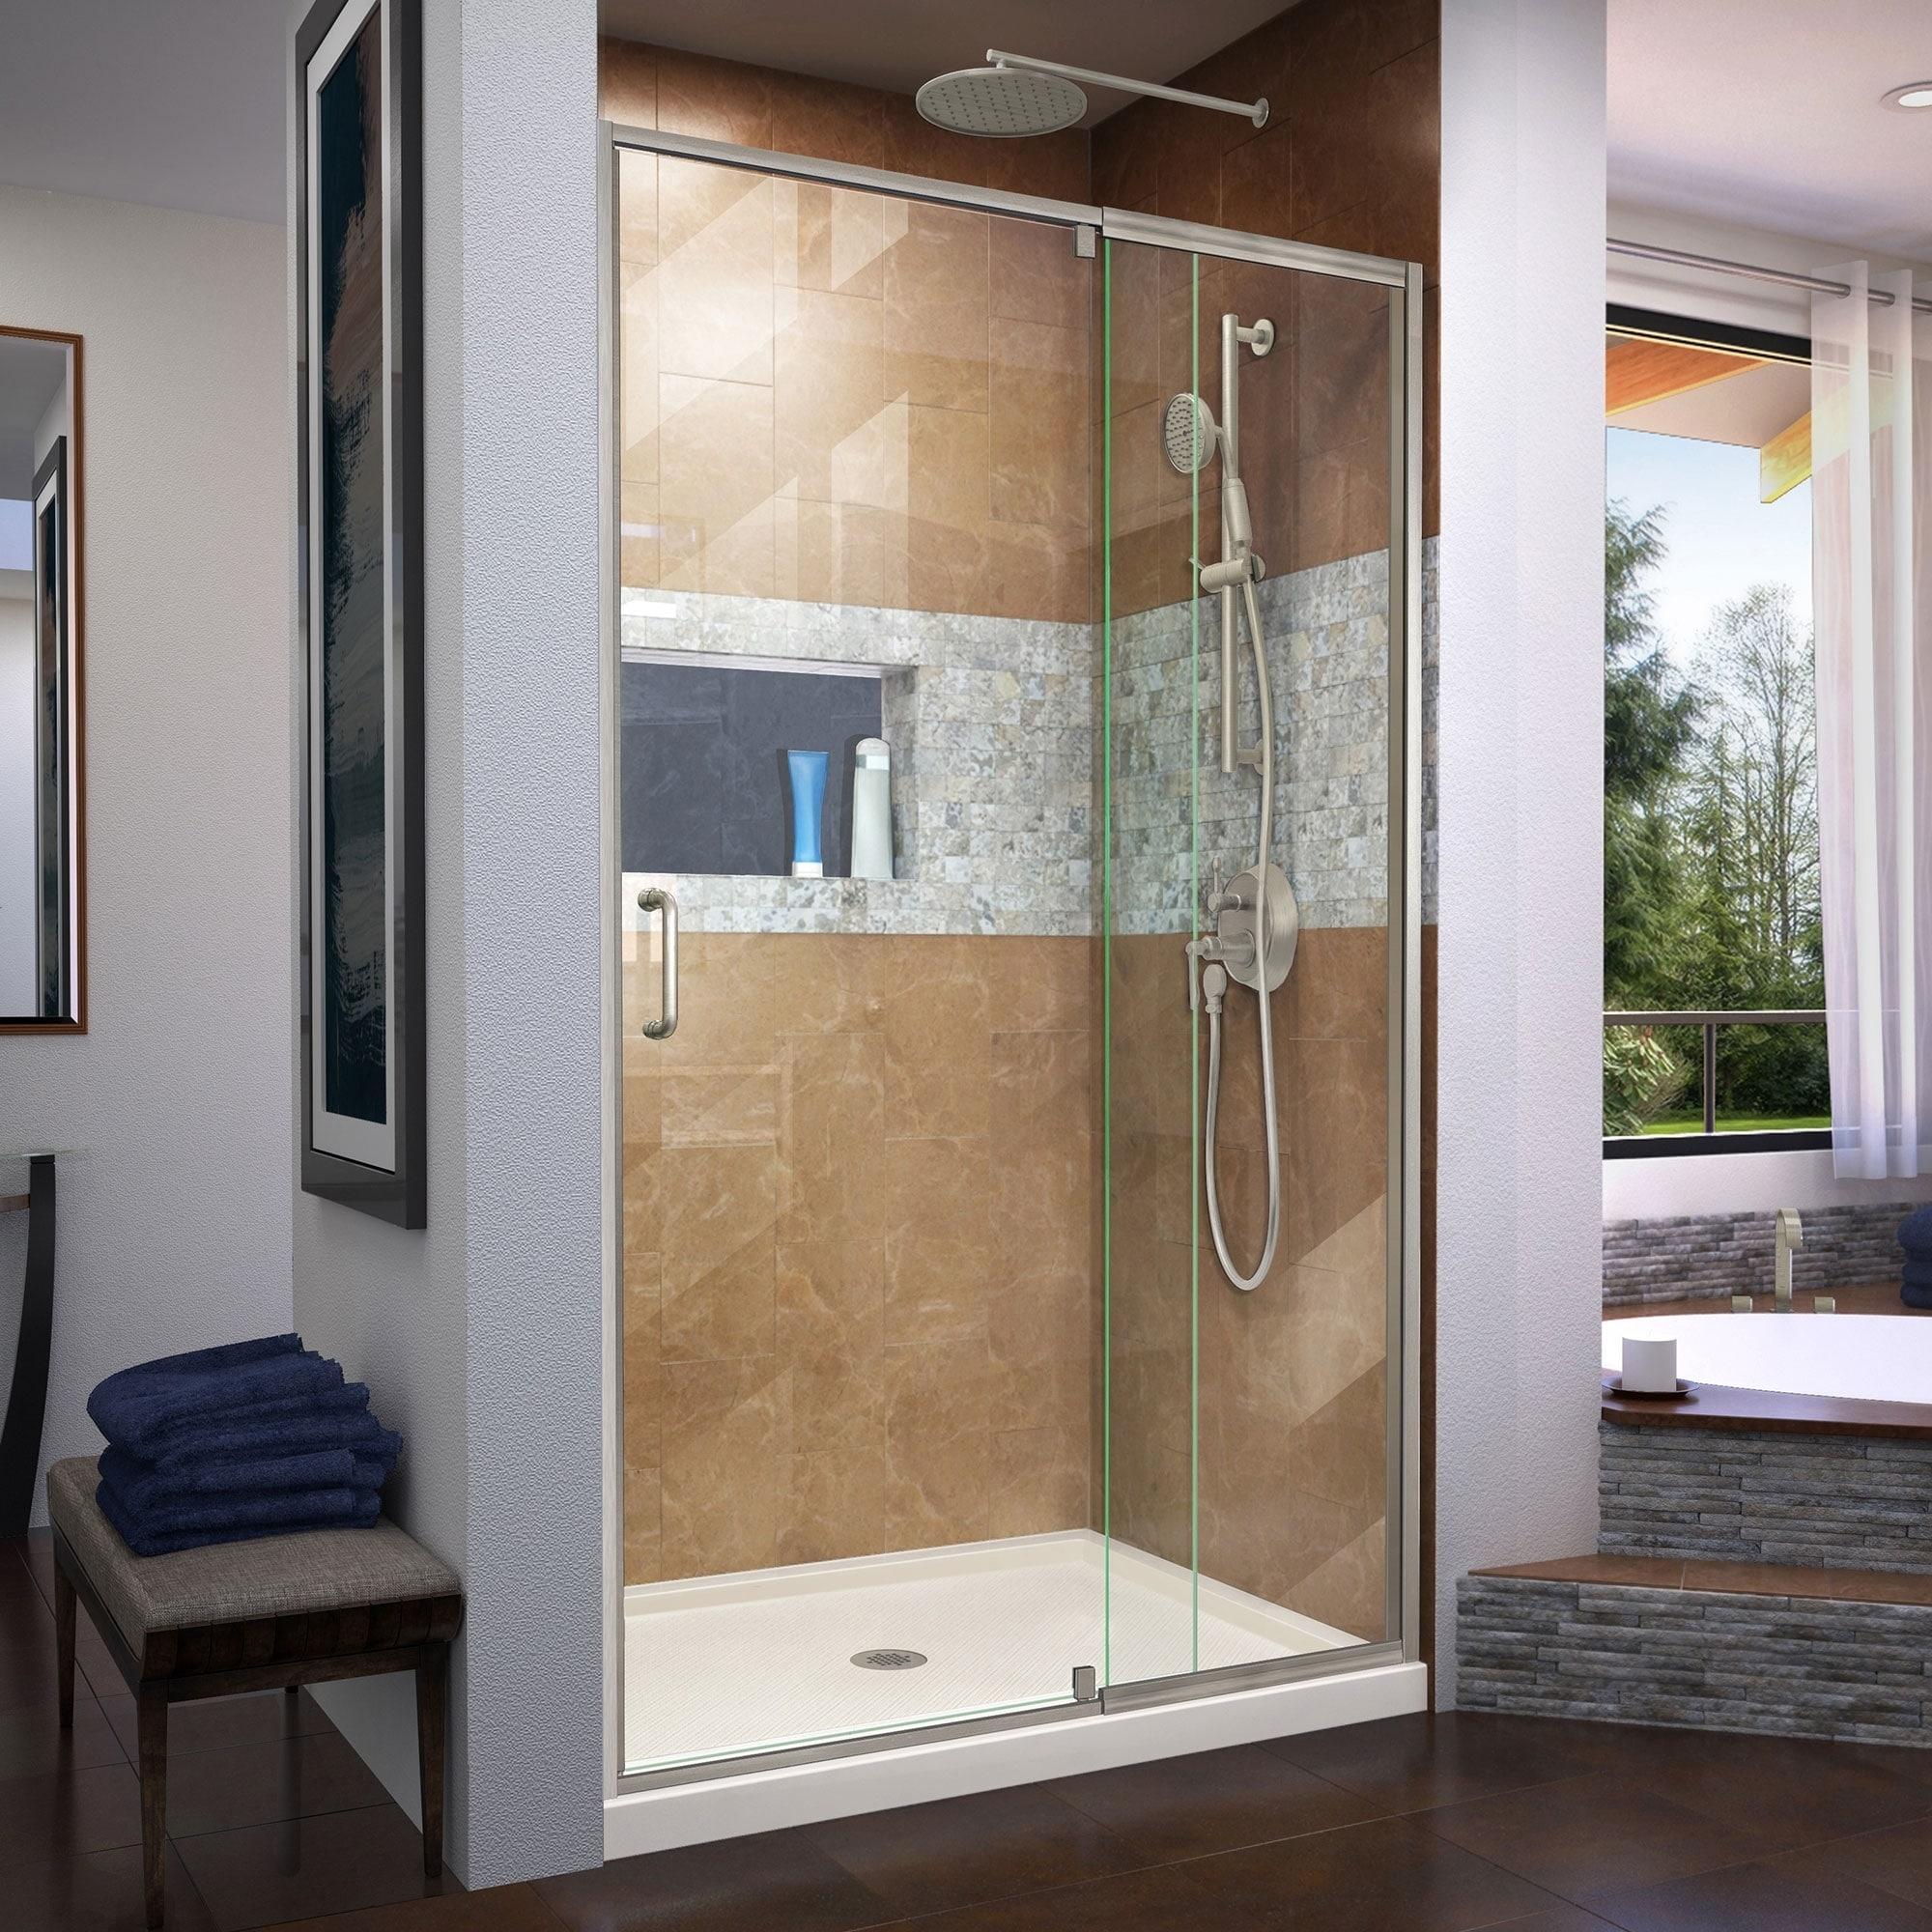 Dreamline Flex 32 In D X 42 In W X 74 3 4 In H Pivot Shower Door And Shower Base Kit 32 X 42